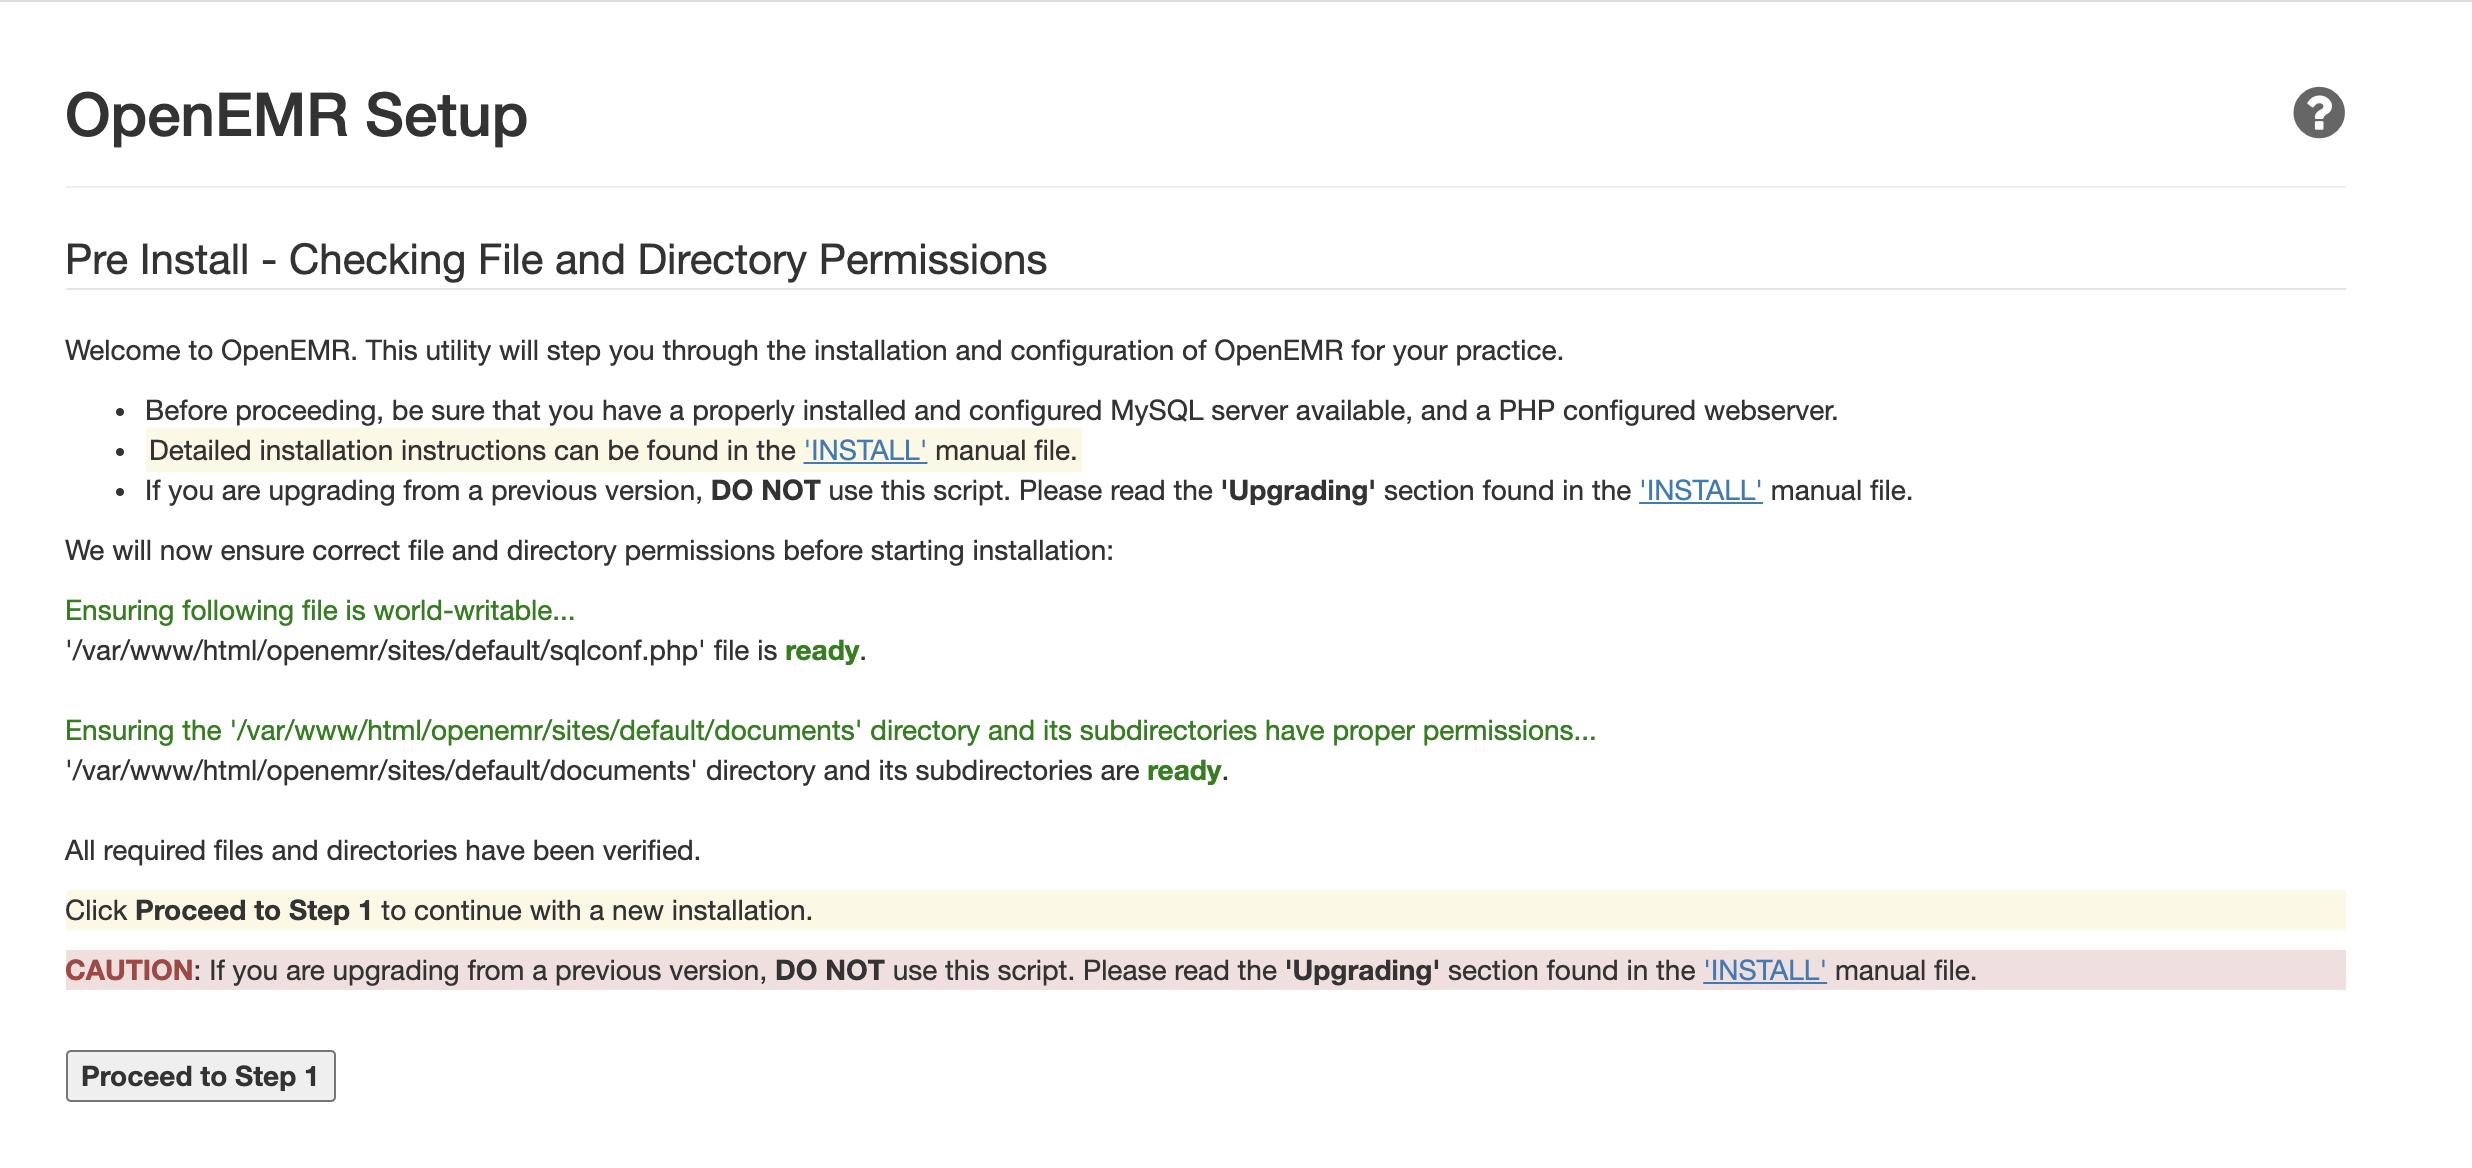 OpenEMR setup page